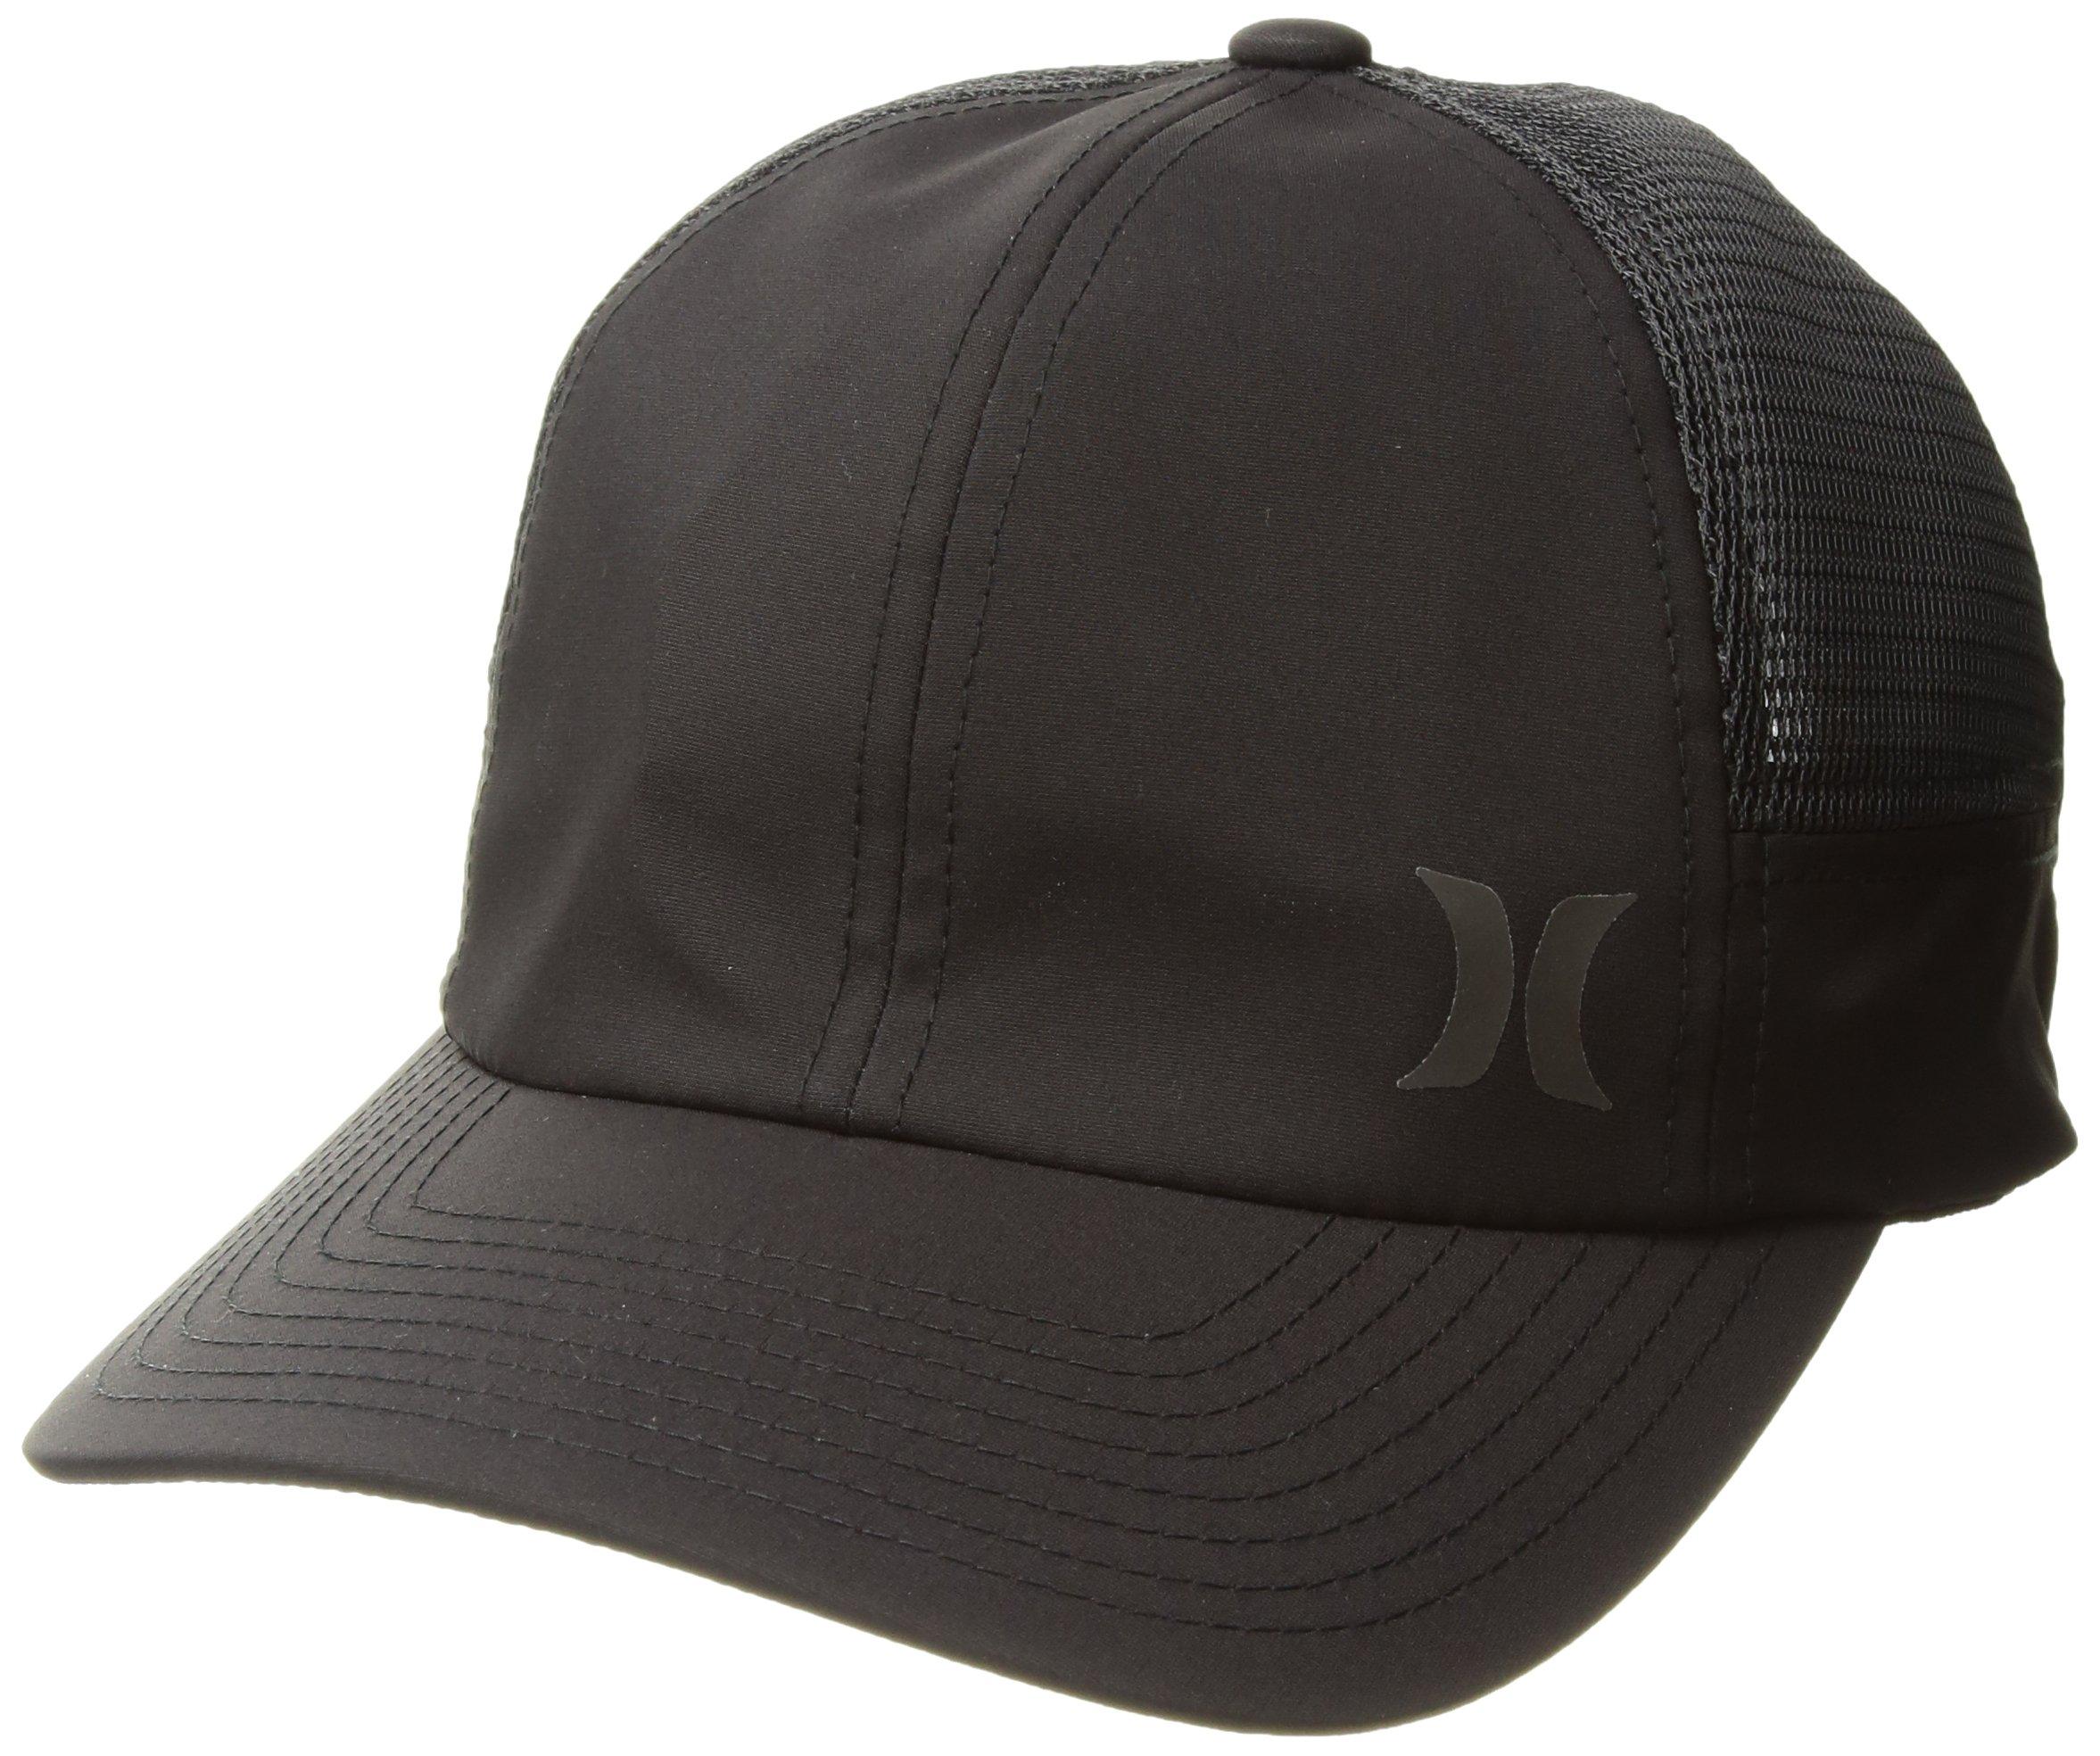 Hurley Layback Hat - Black